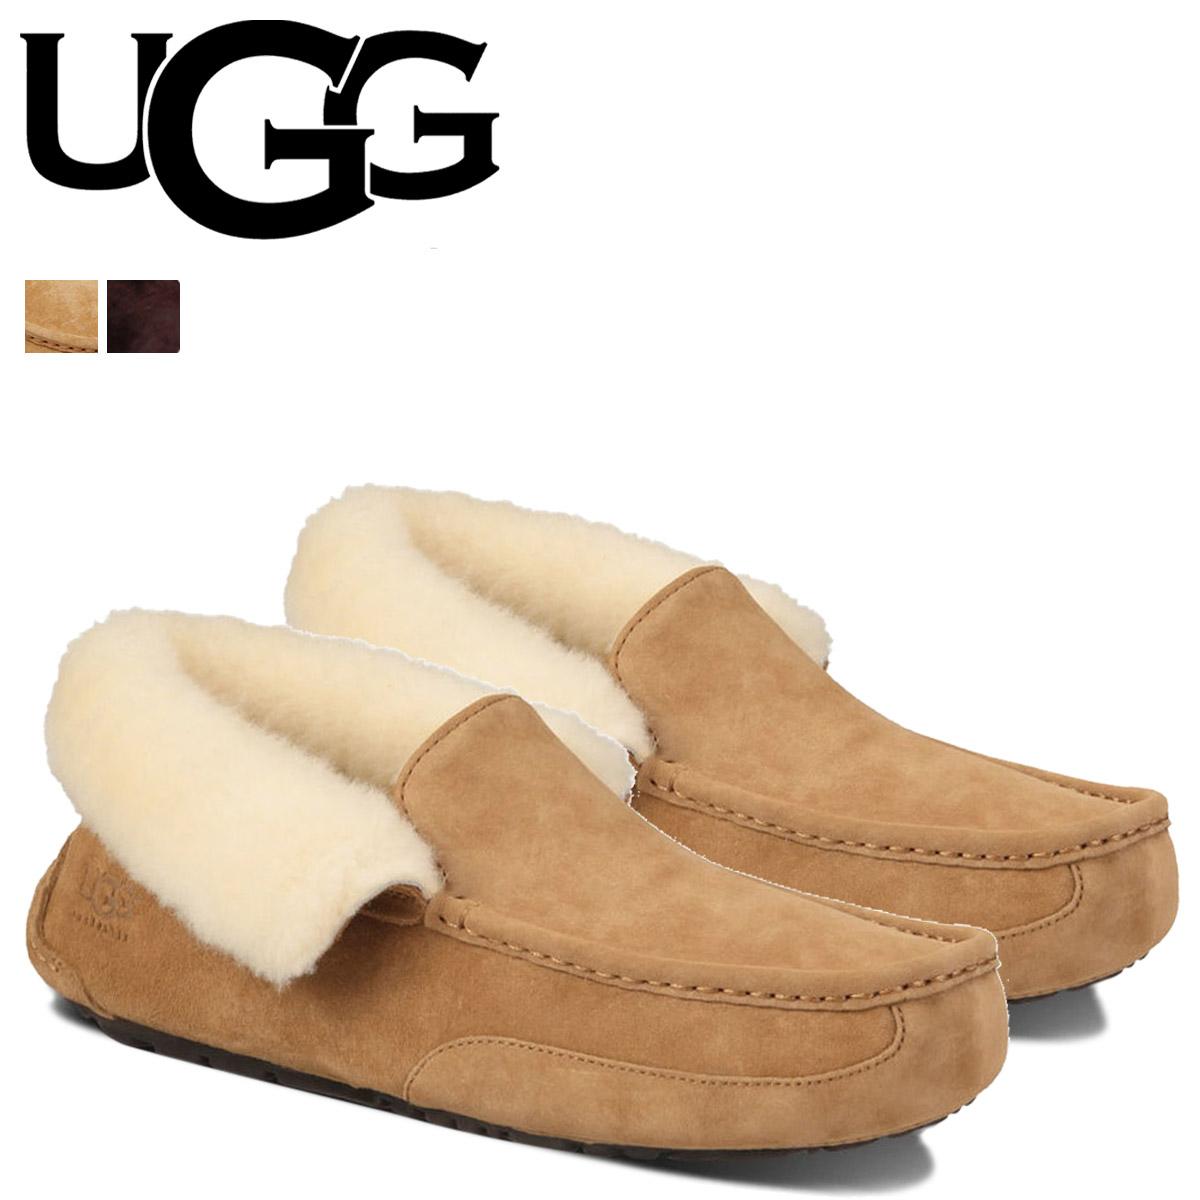 3a6b1563eff UGG UGG mens MENS GRANTT slip-on grant 1005255 chestnut [9/30 new in stock]